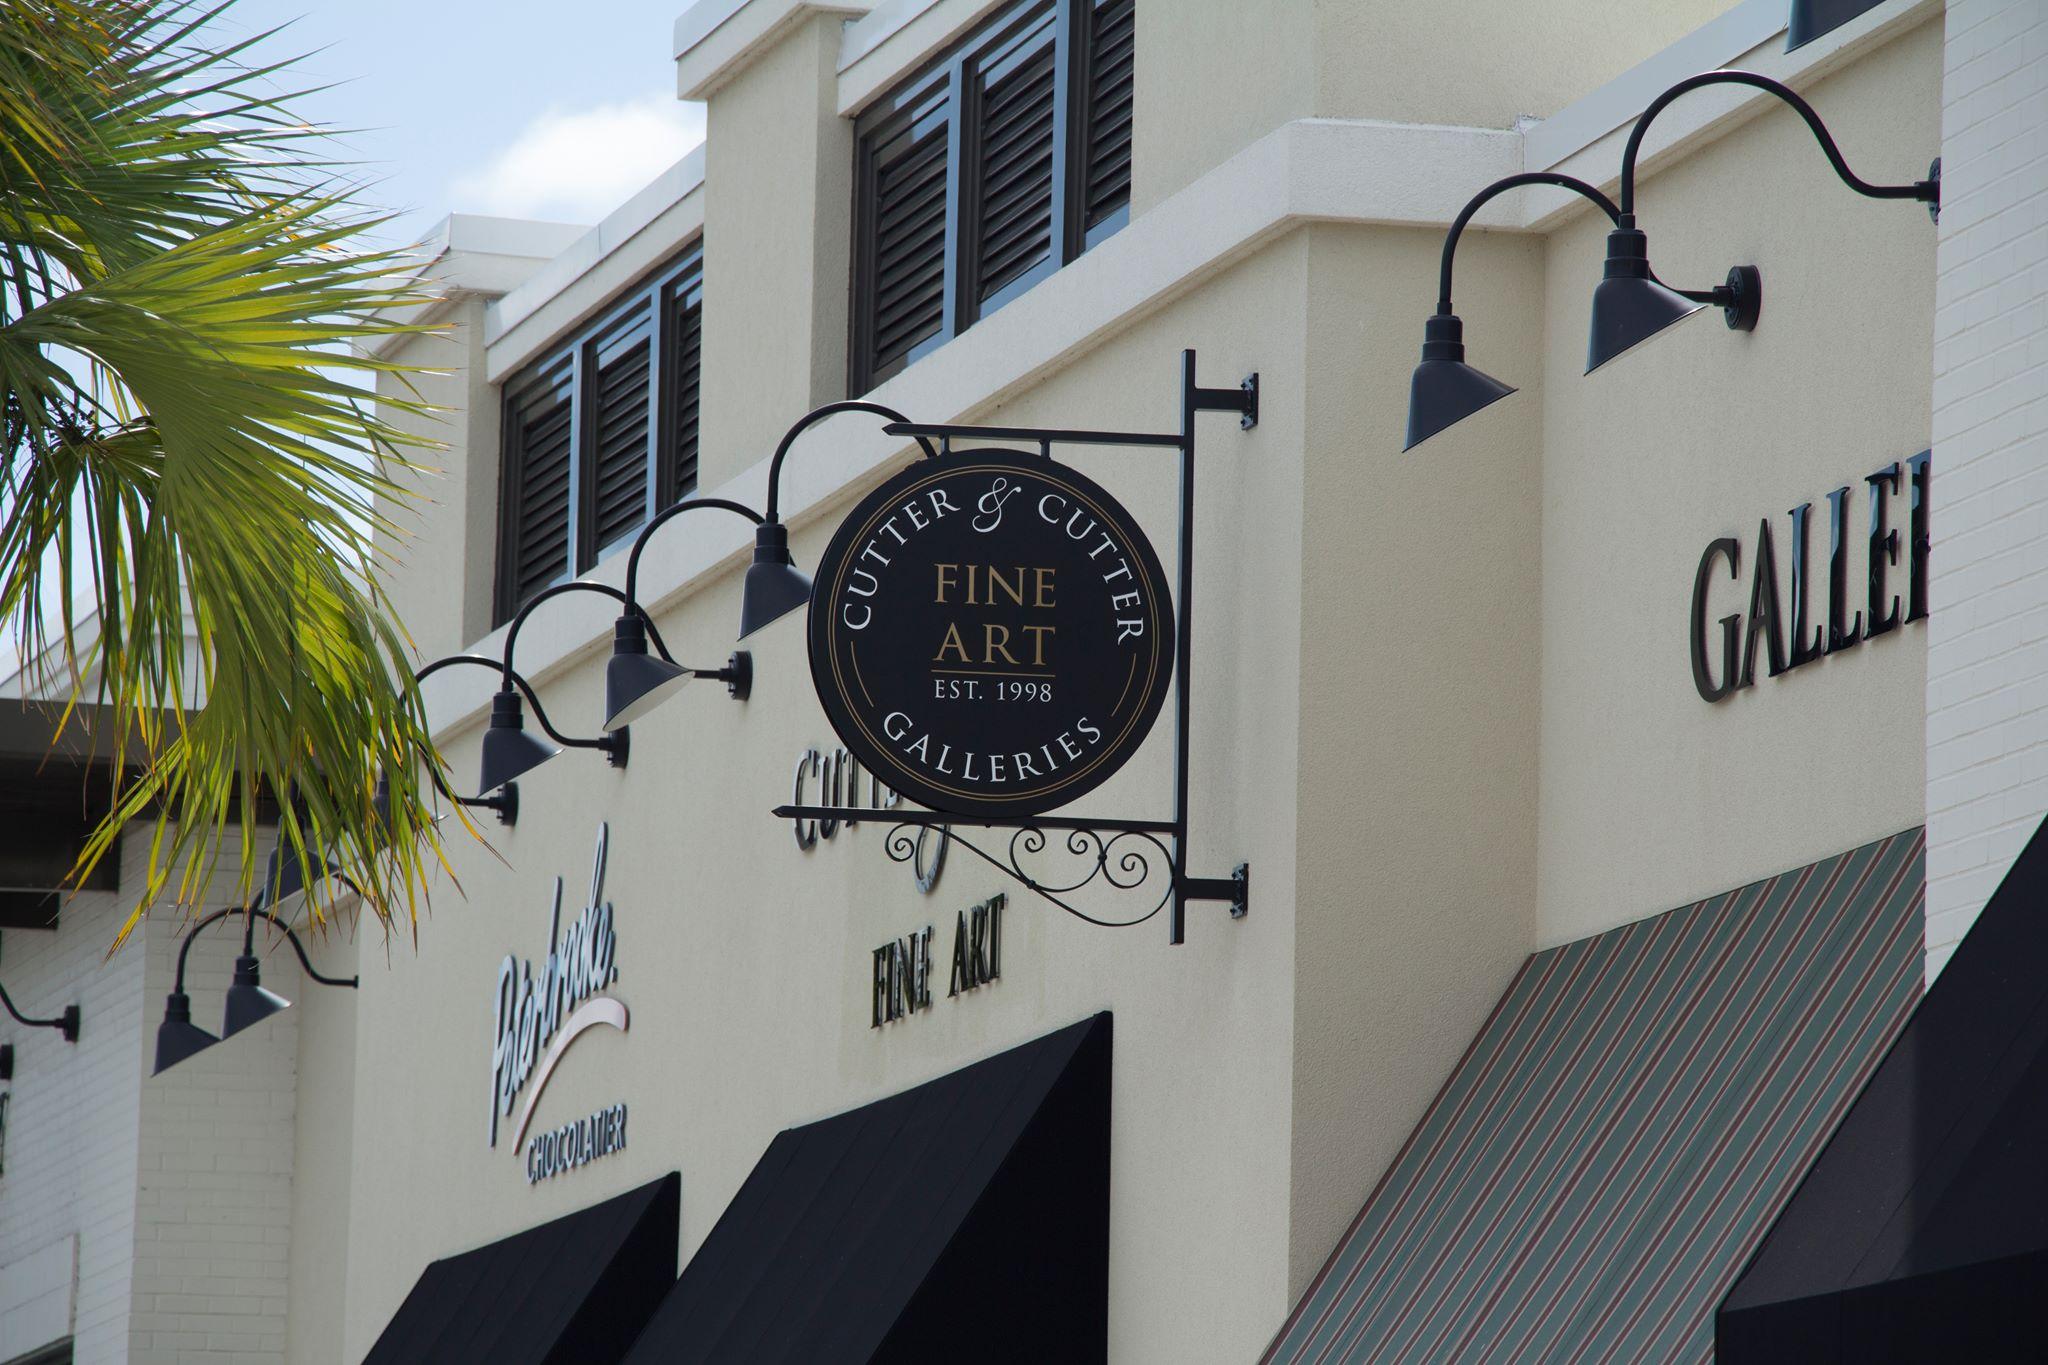 Cutter & Cutter Fine Art 25 King St. St. Augustine, FL 32084 Phone 904-810-0460